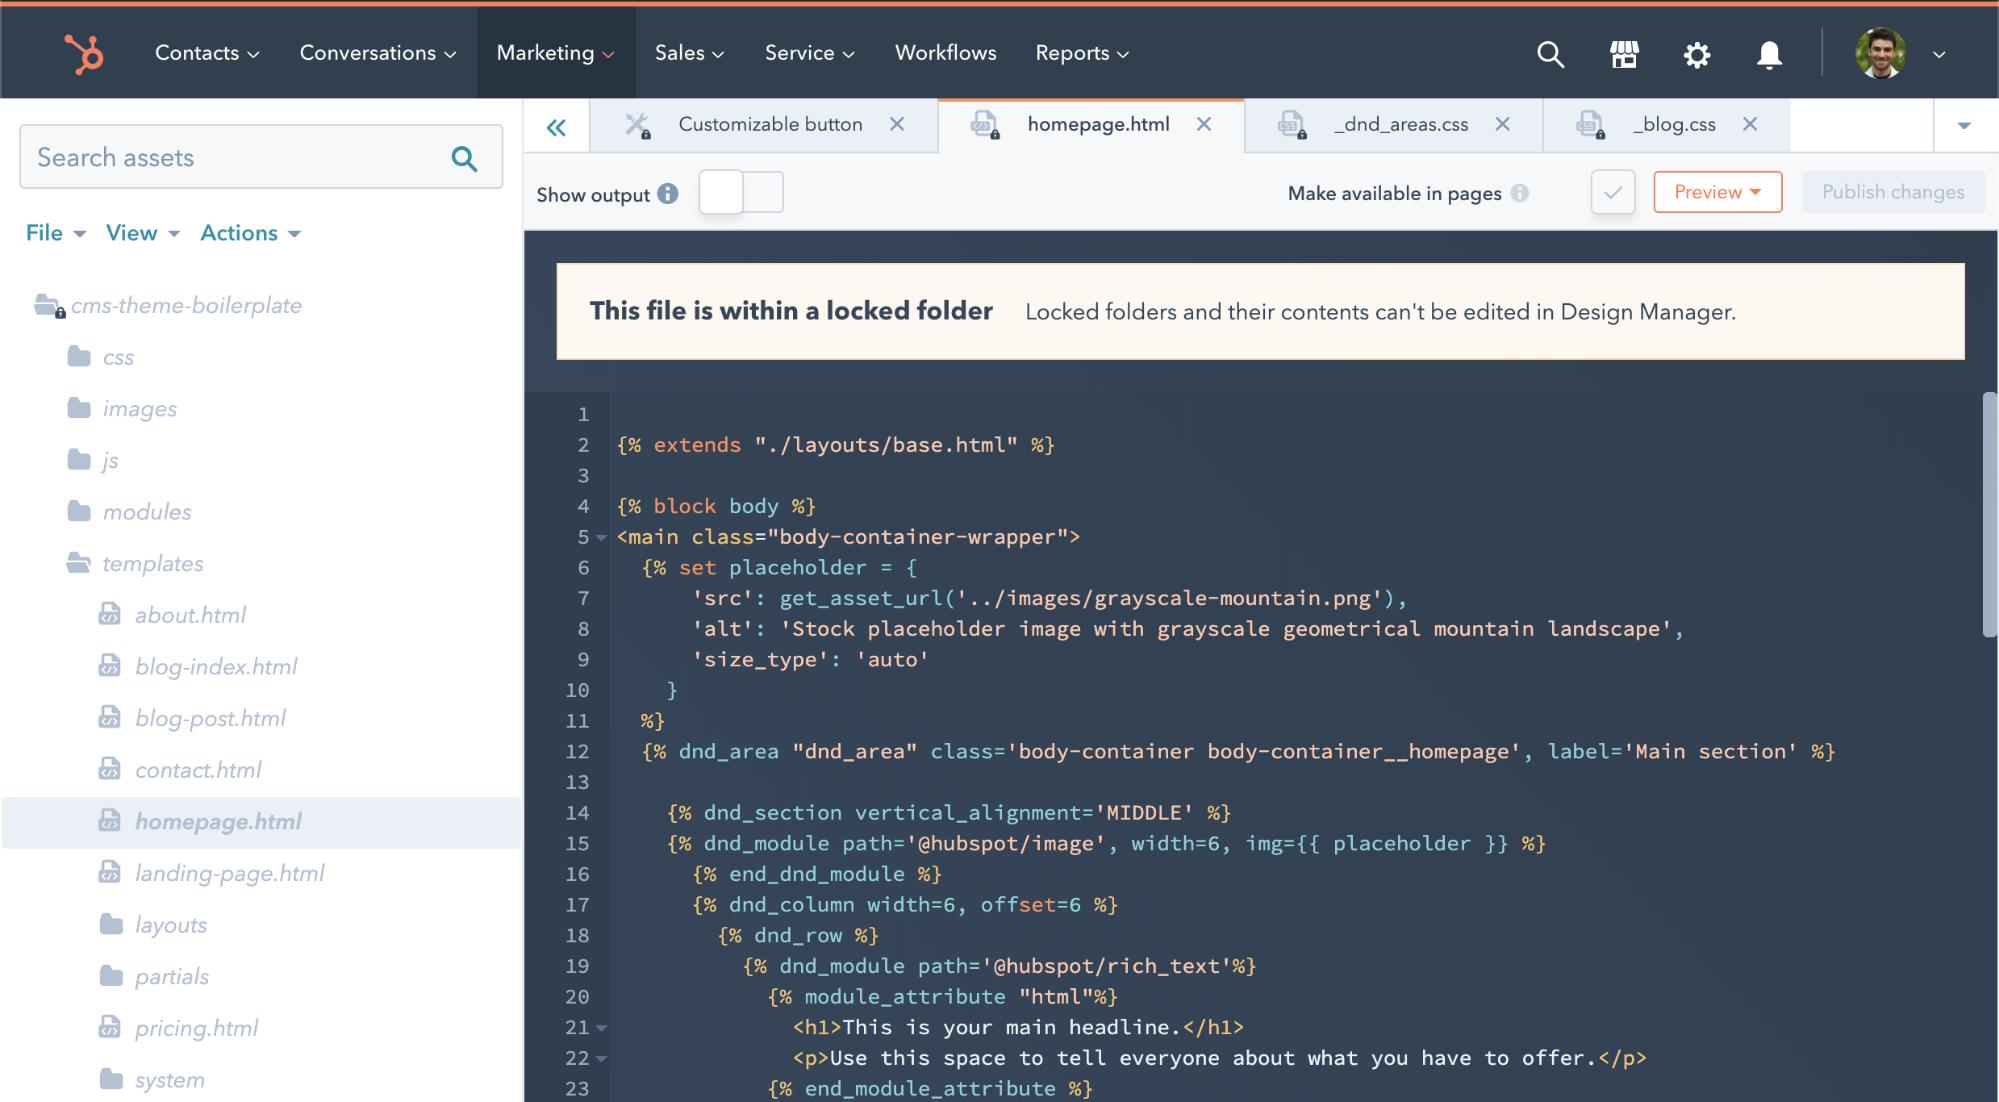 screenshot showing locked folder in Design Manager